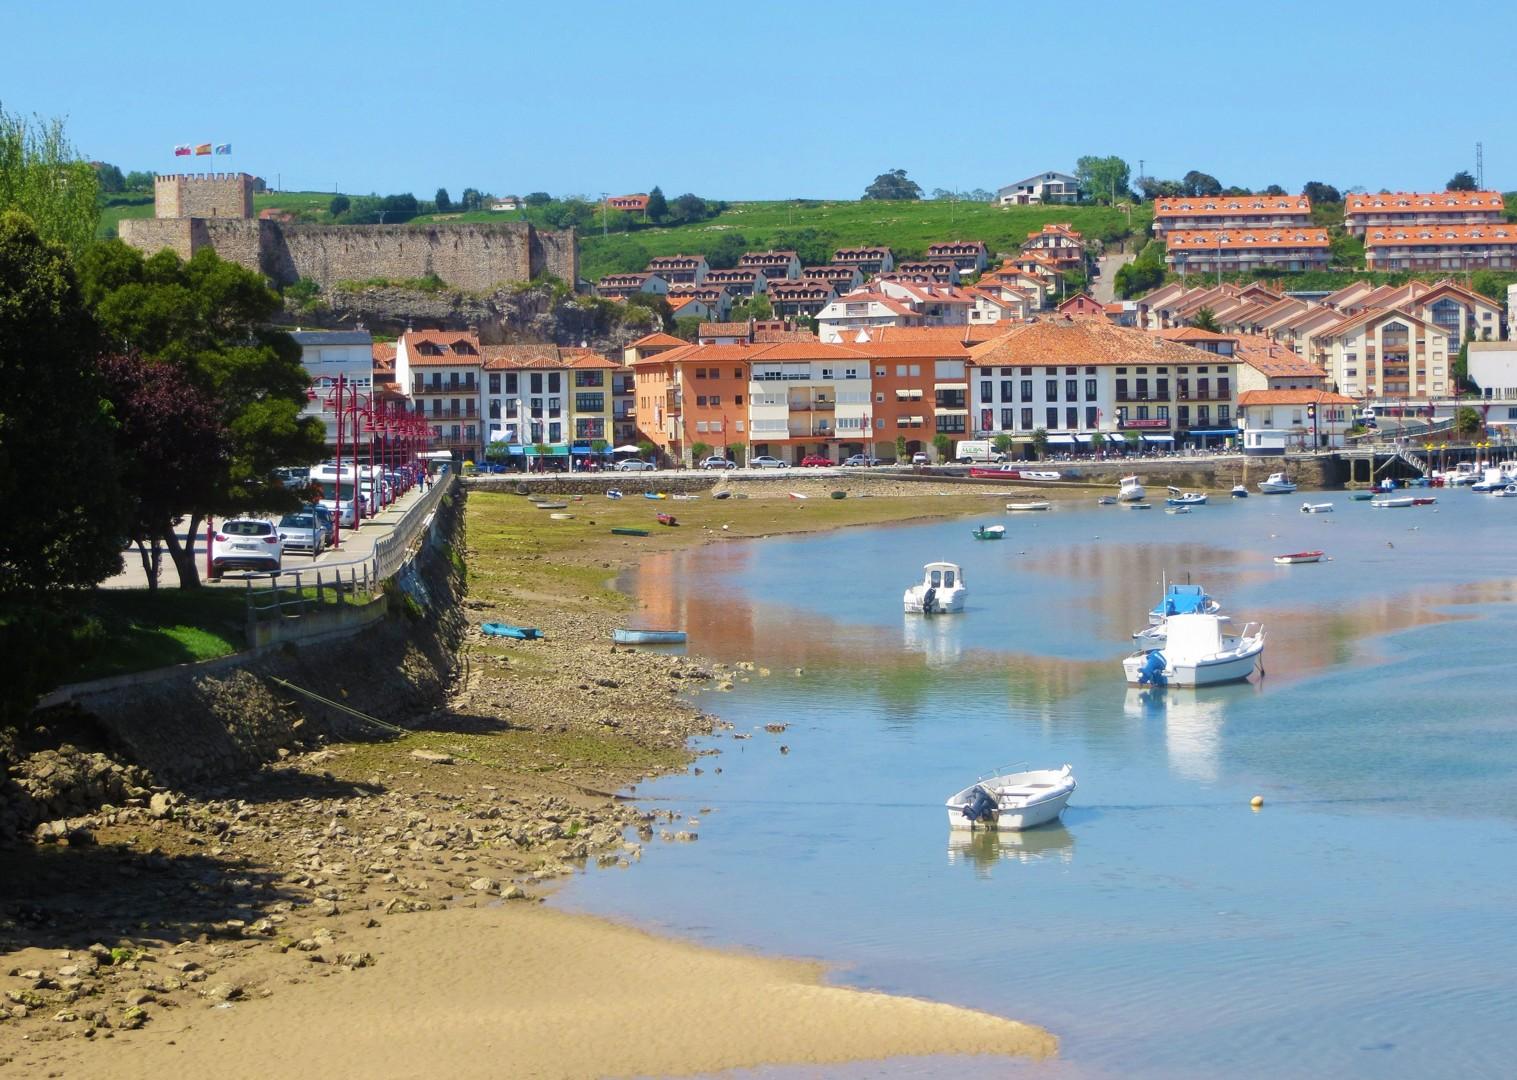 _Holiday.616.17565.jpg - Spain - Asturian Coastal Ride - Guided Family Cycling Holiday - Family Cycling